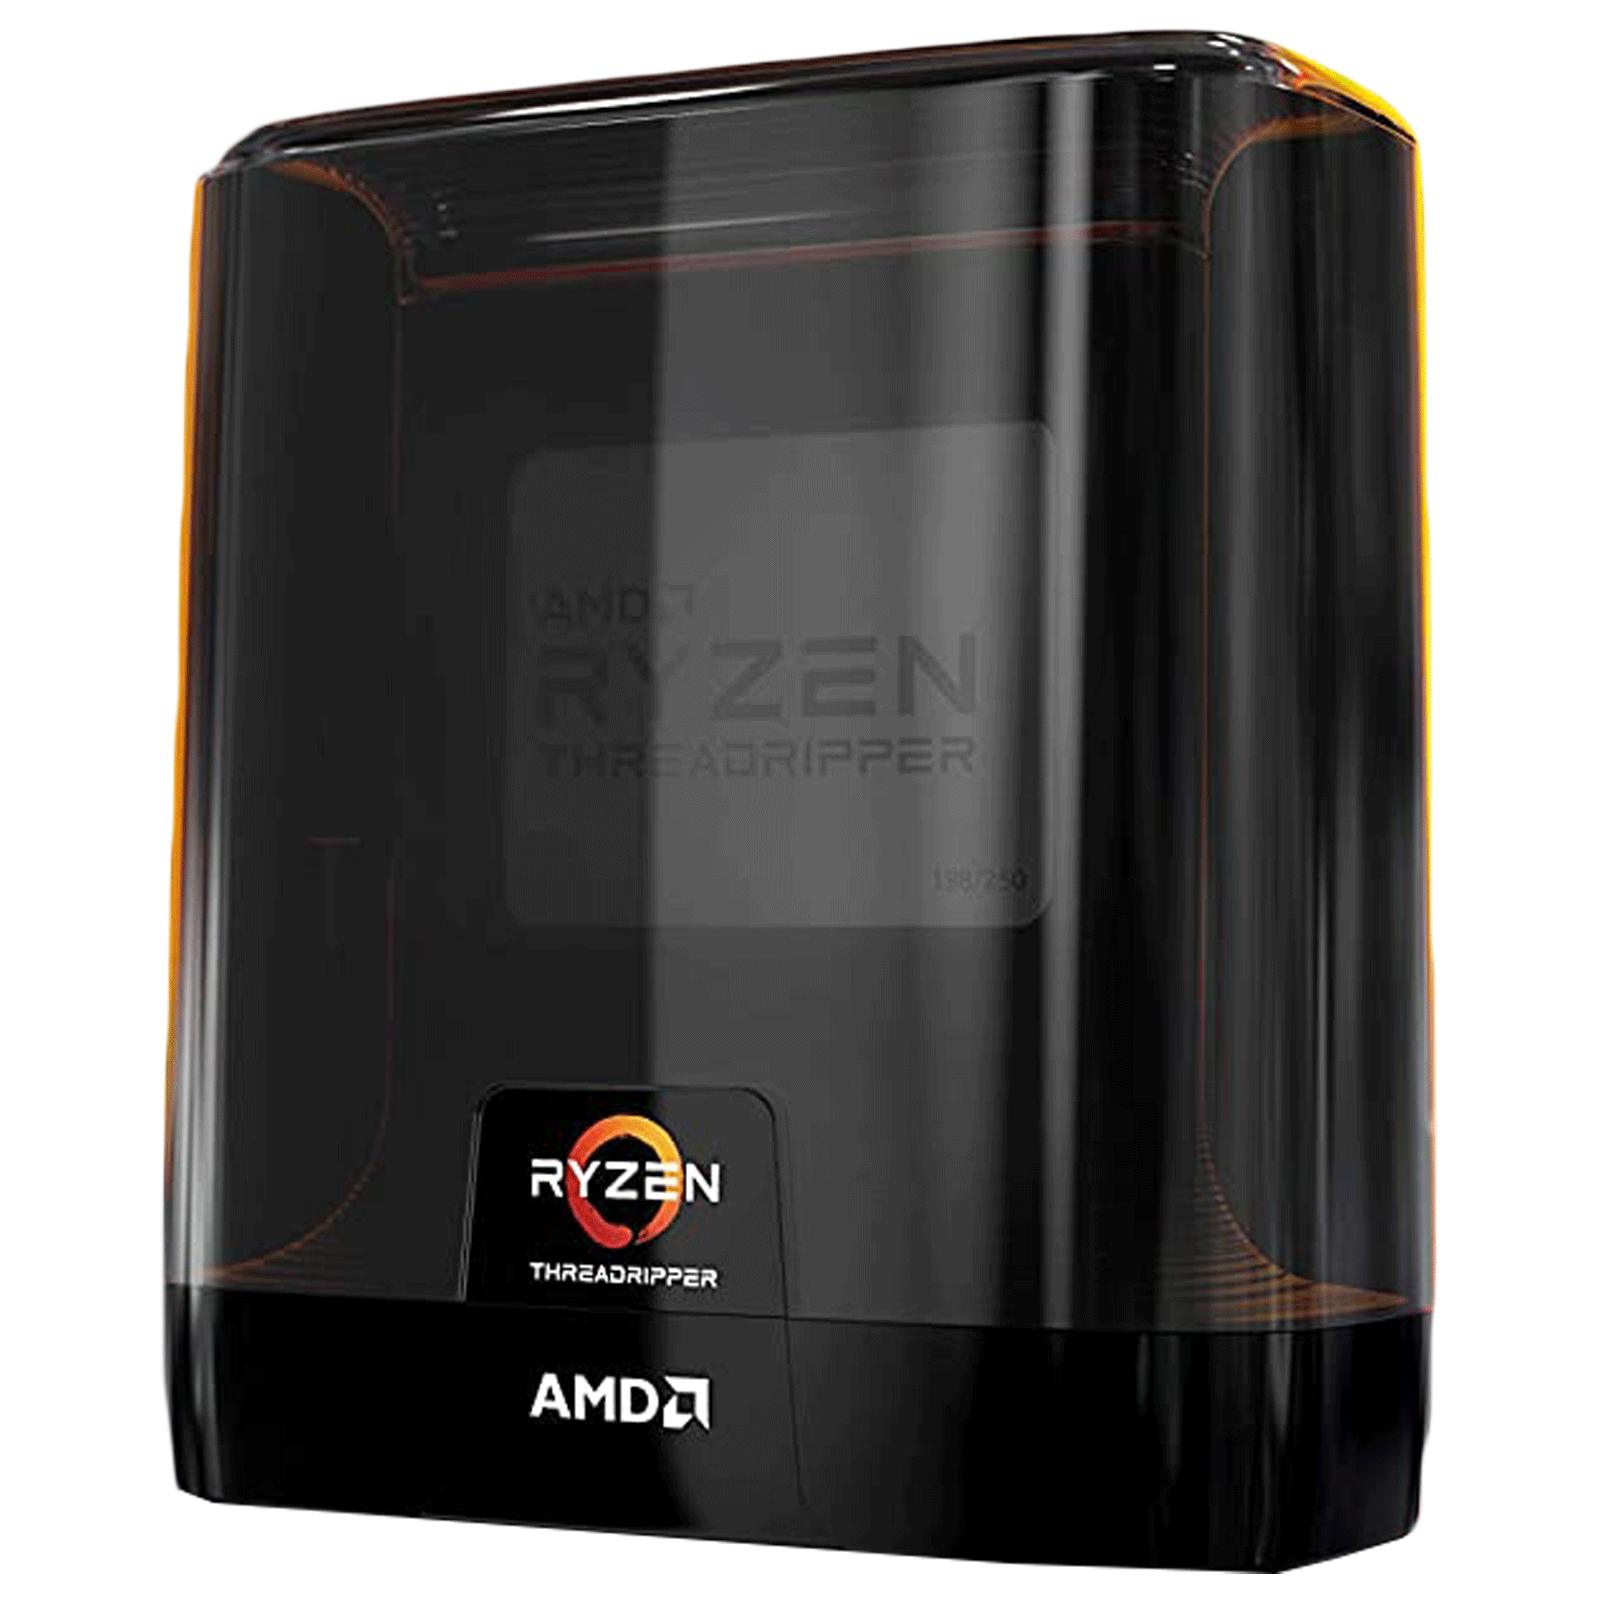 AMD Ryzen Threadripper Desktop Processor (64 Cores, 2.9 GHz, AMD Zen Core Architecture, 3990X, Silver)_1